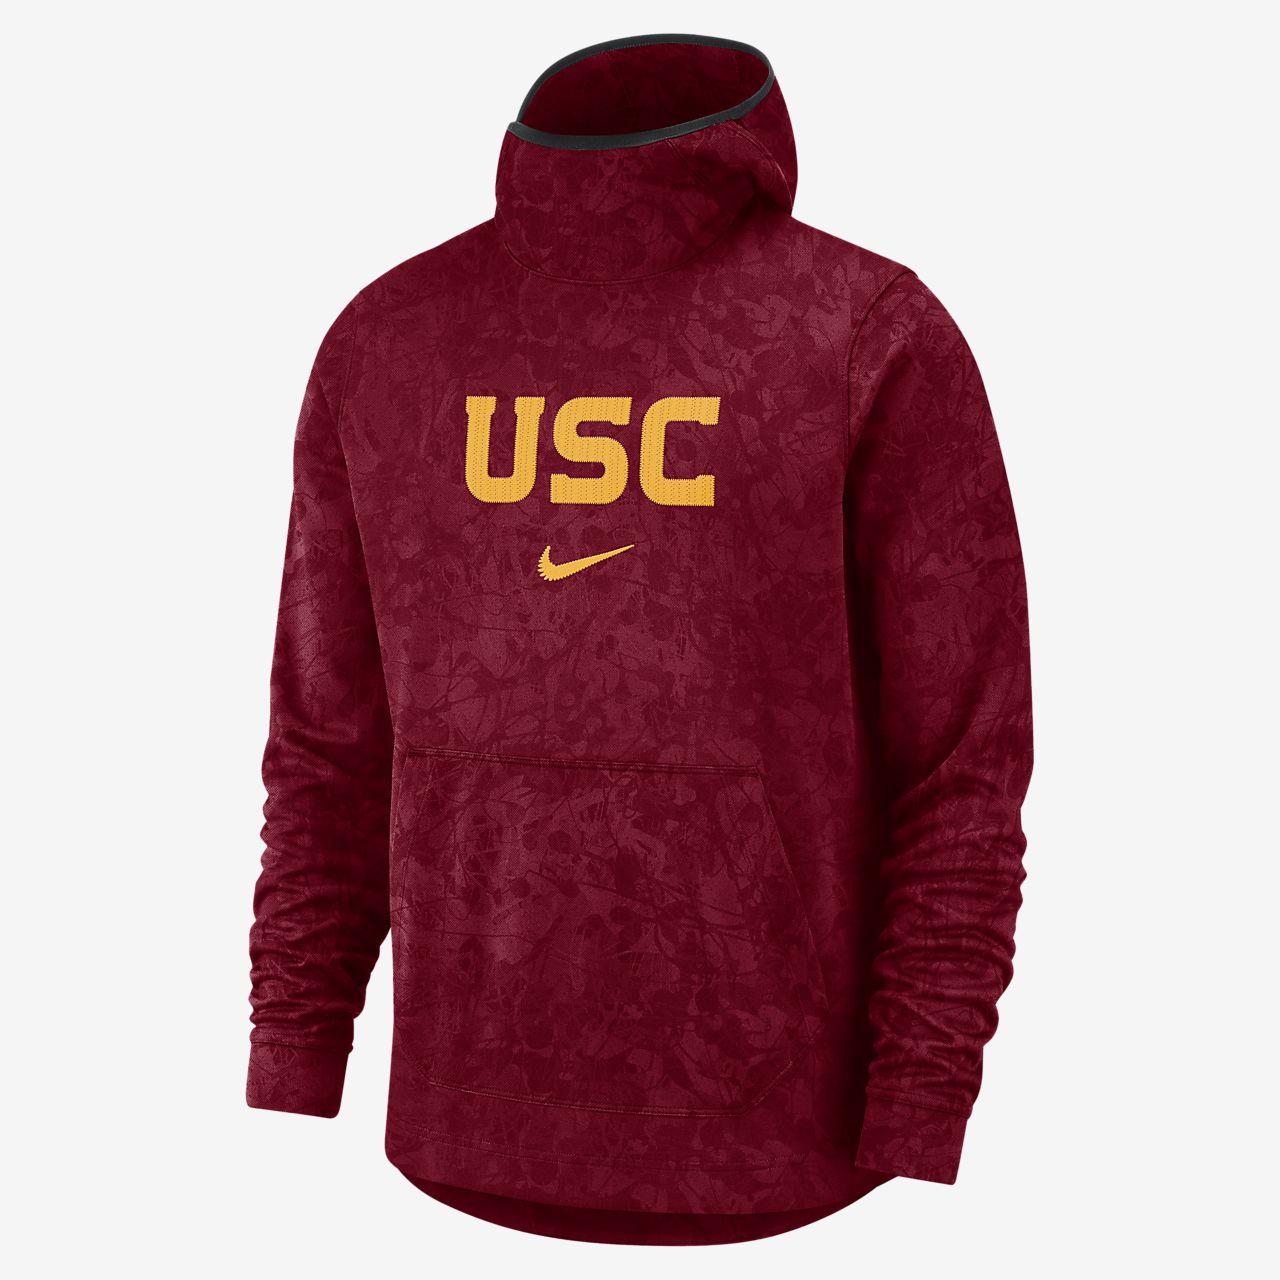 Nike College Dri-FIT Spotlight (USC) Men's Pullover Basketball Hoodie